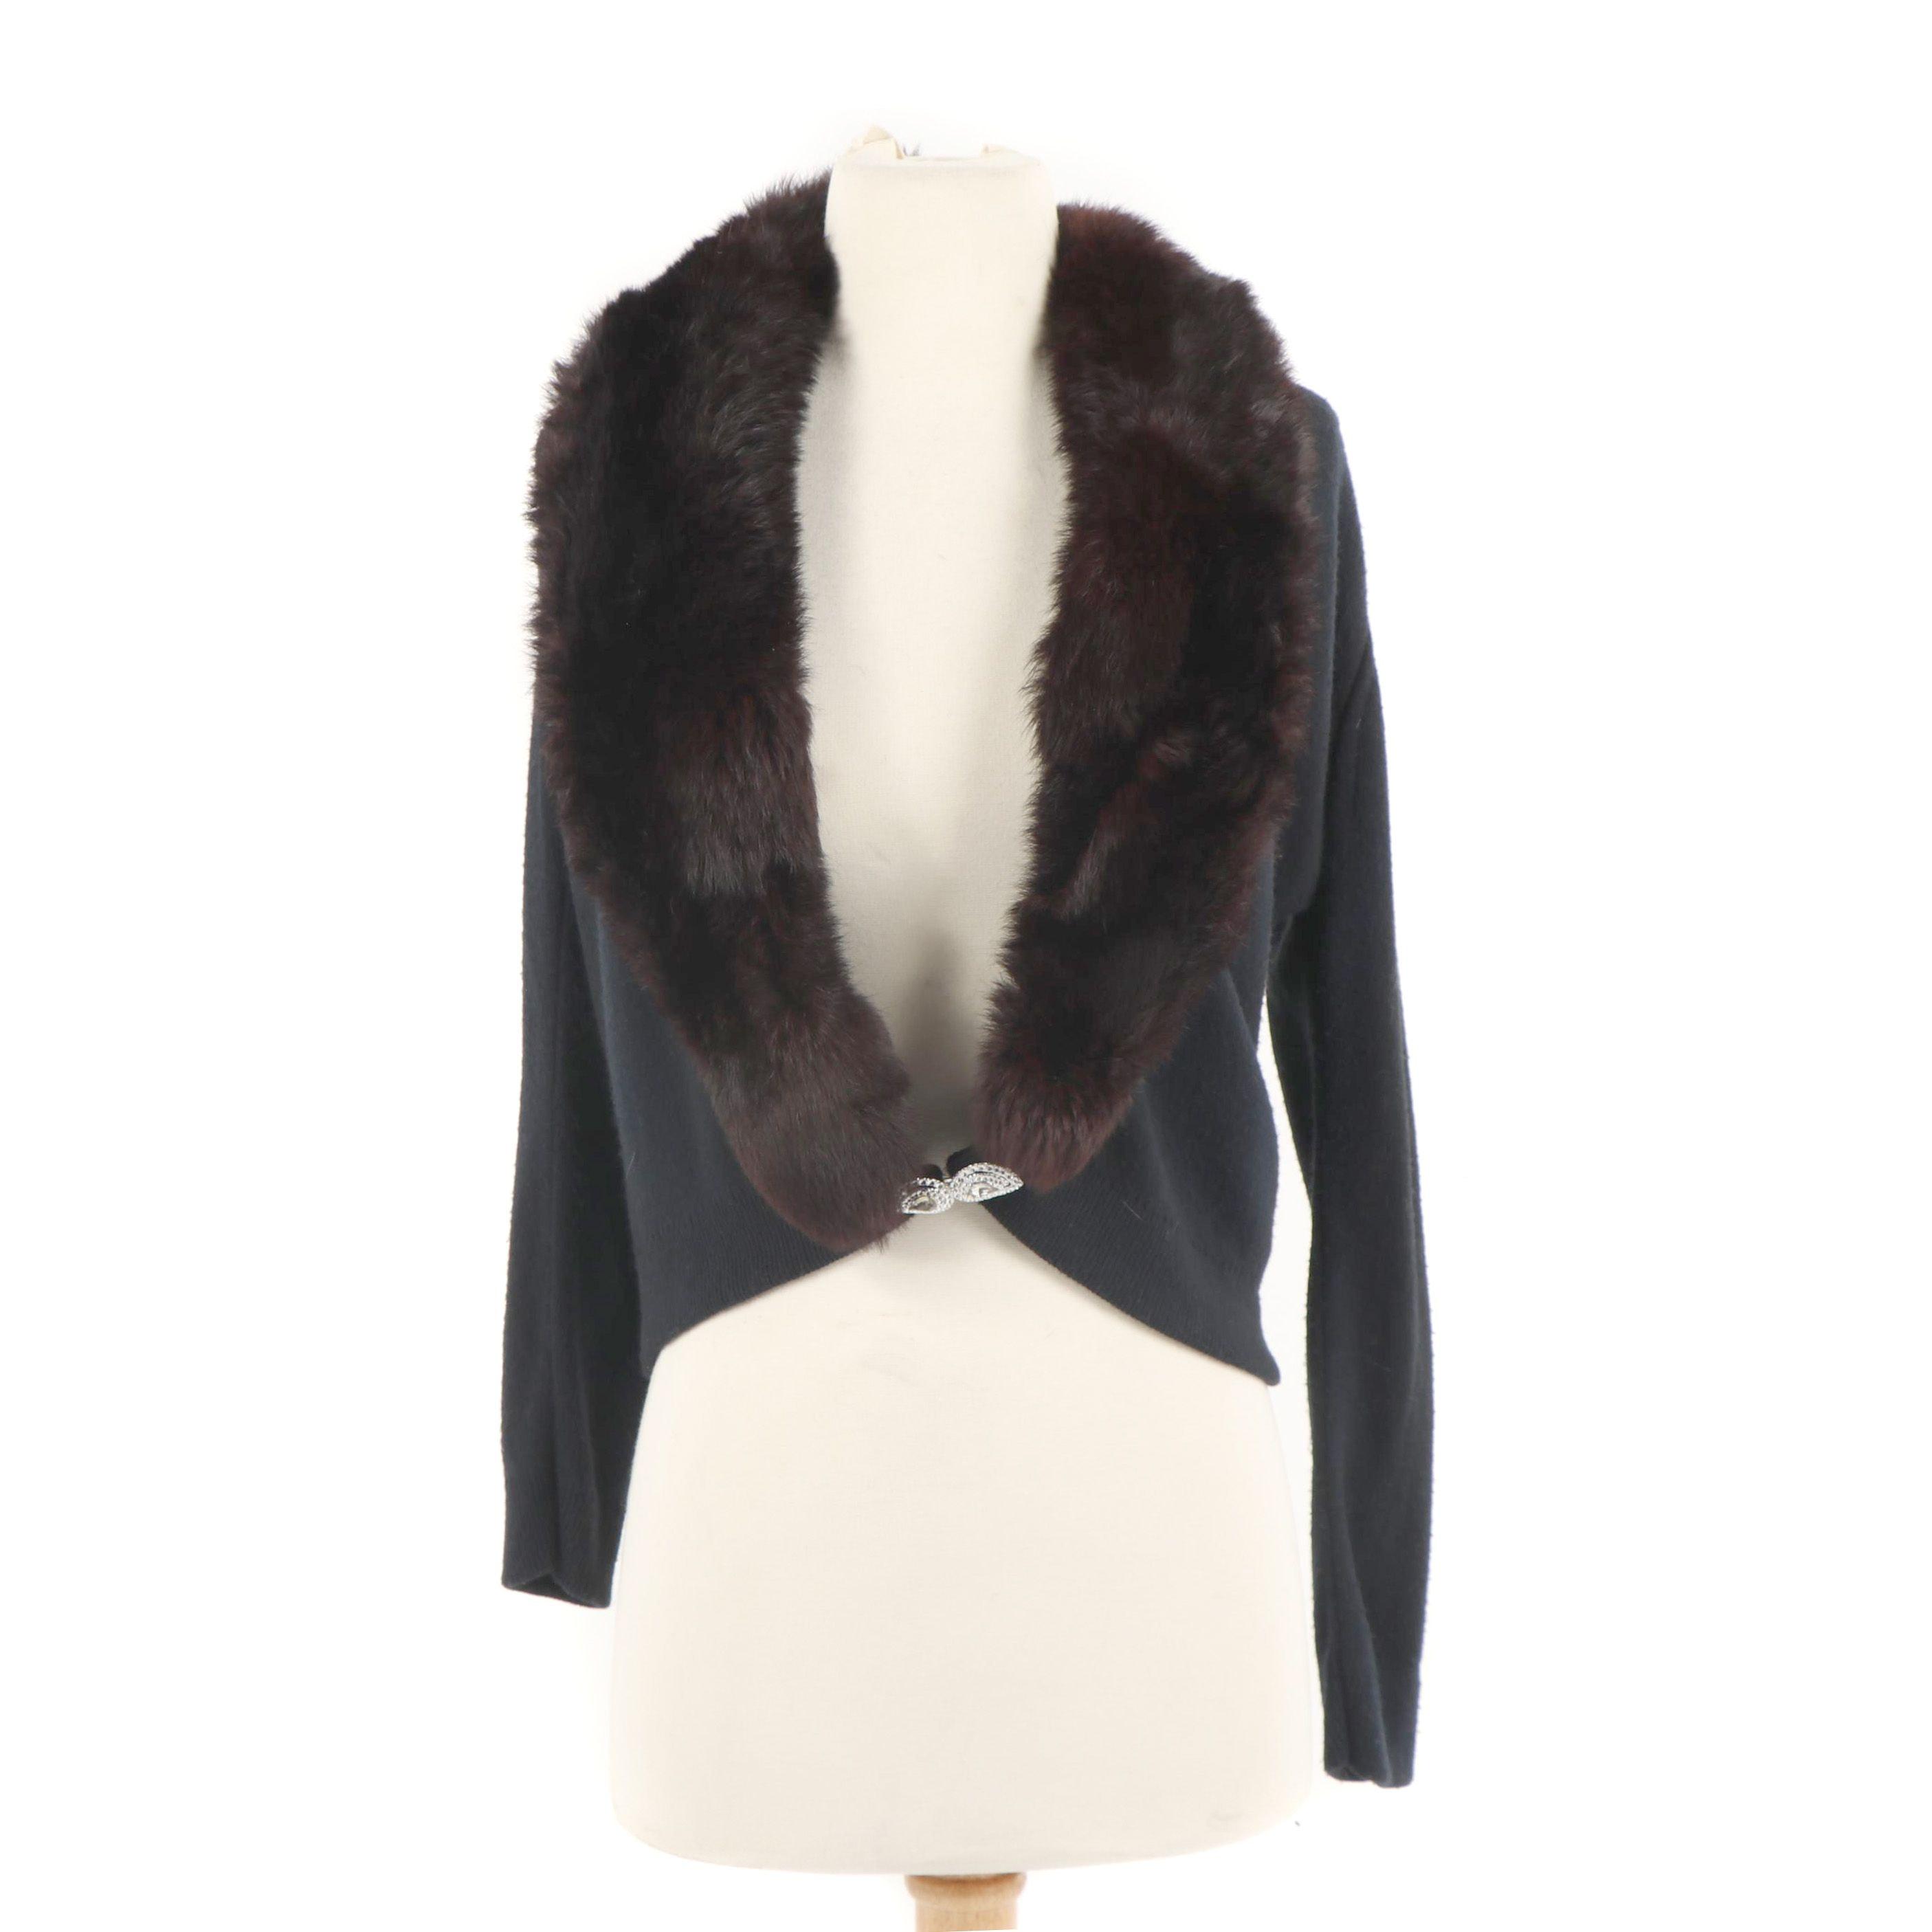 Women's Vintage Lady Carla Black Knit Cardigan with Rabbit Fur Collar